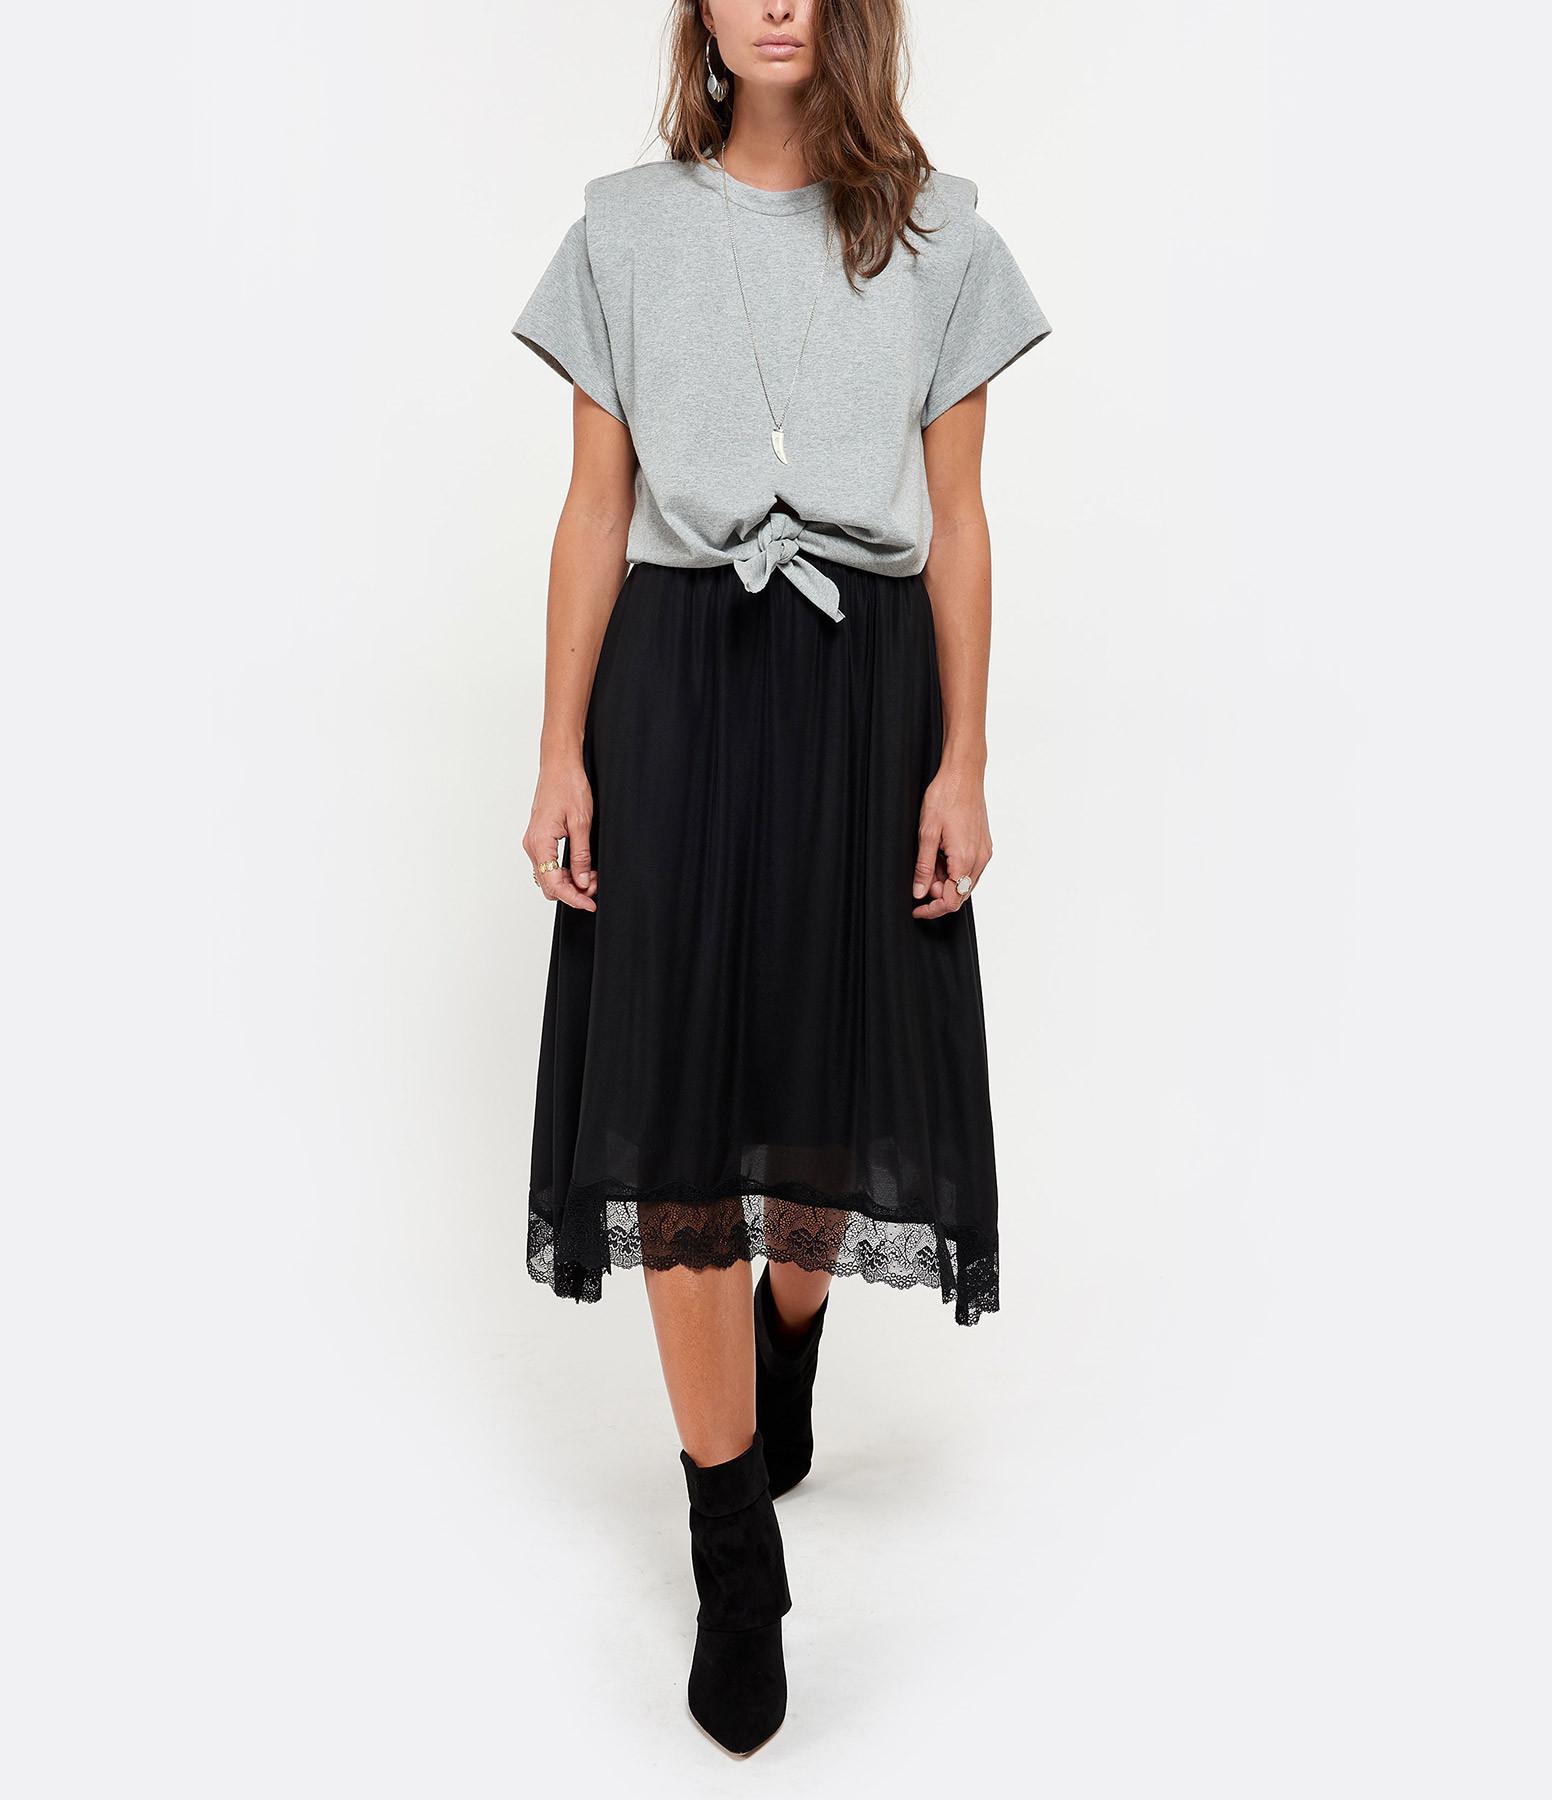 ISABEL MARANT - Tee-shirt Belita Gris